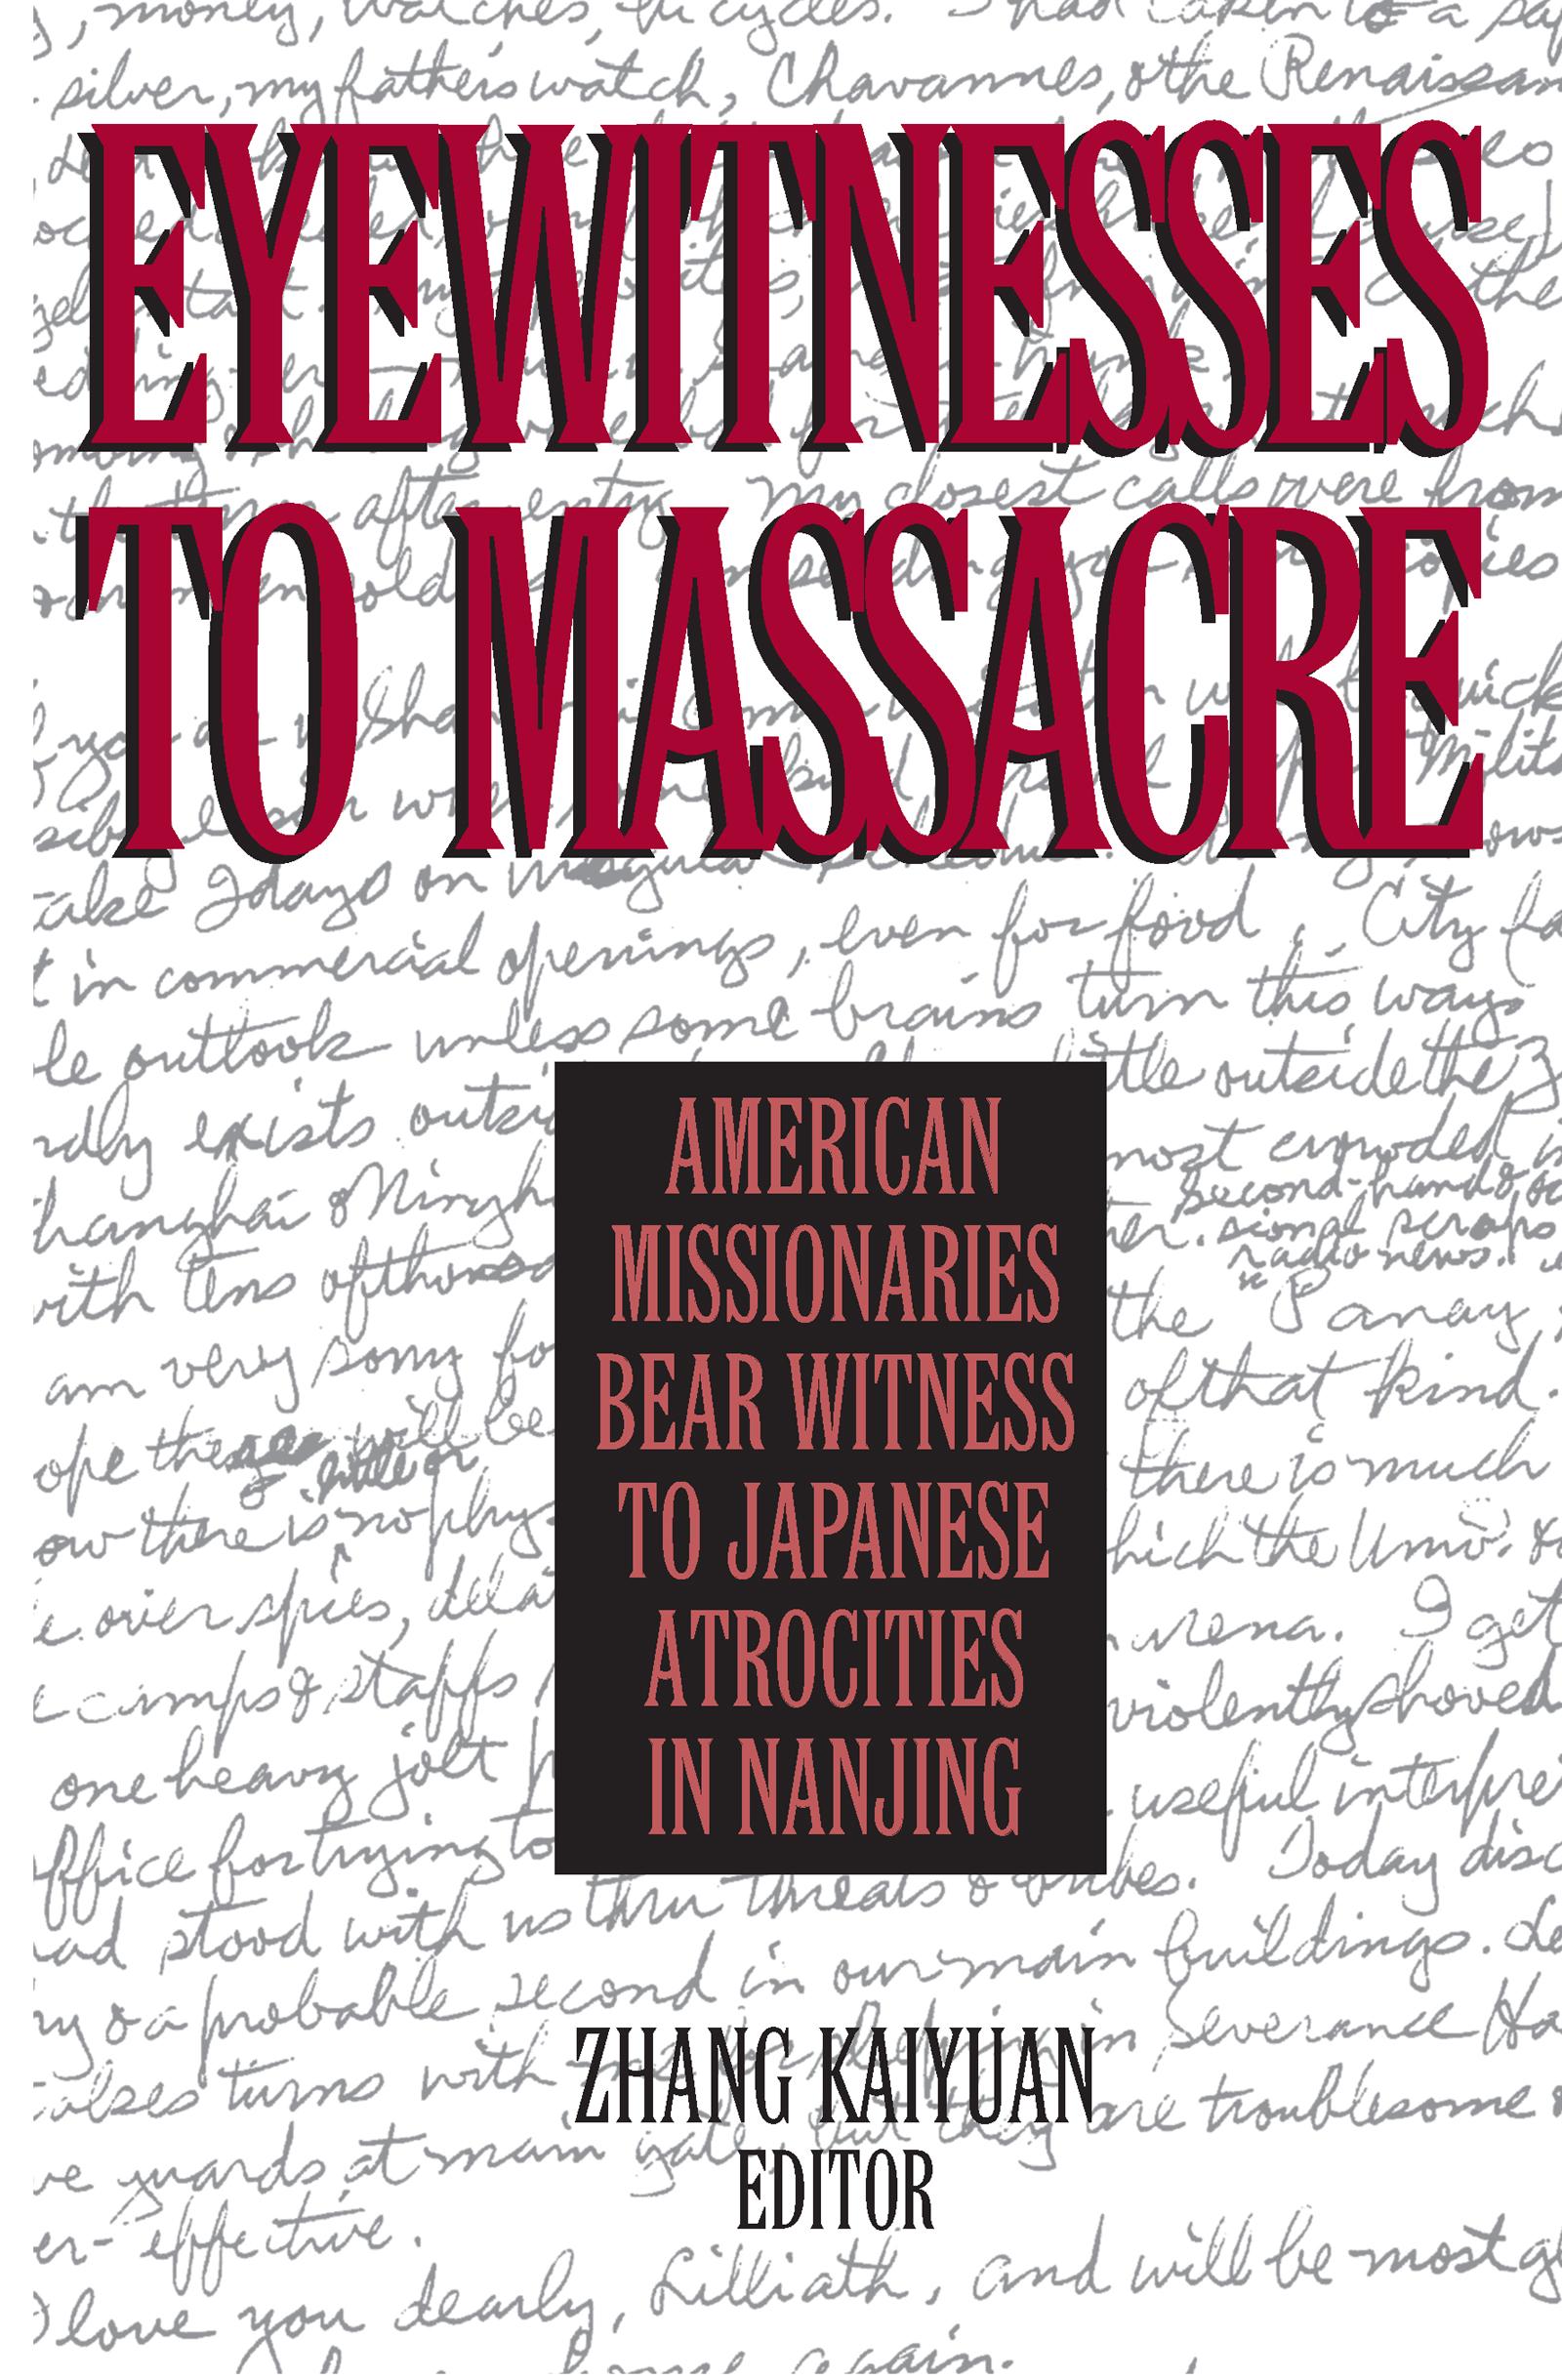 Eyewitnesses to Massacre: American Missionaries Bear Witness to Japanese Atrocities in Nanjing